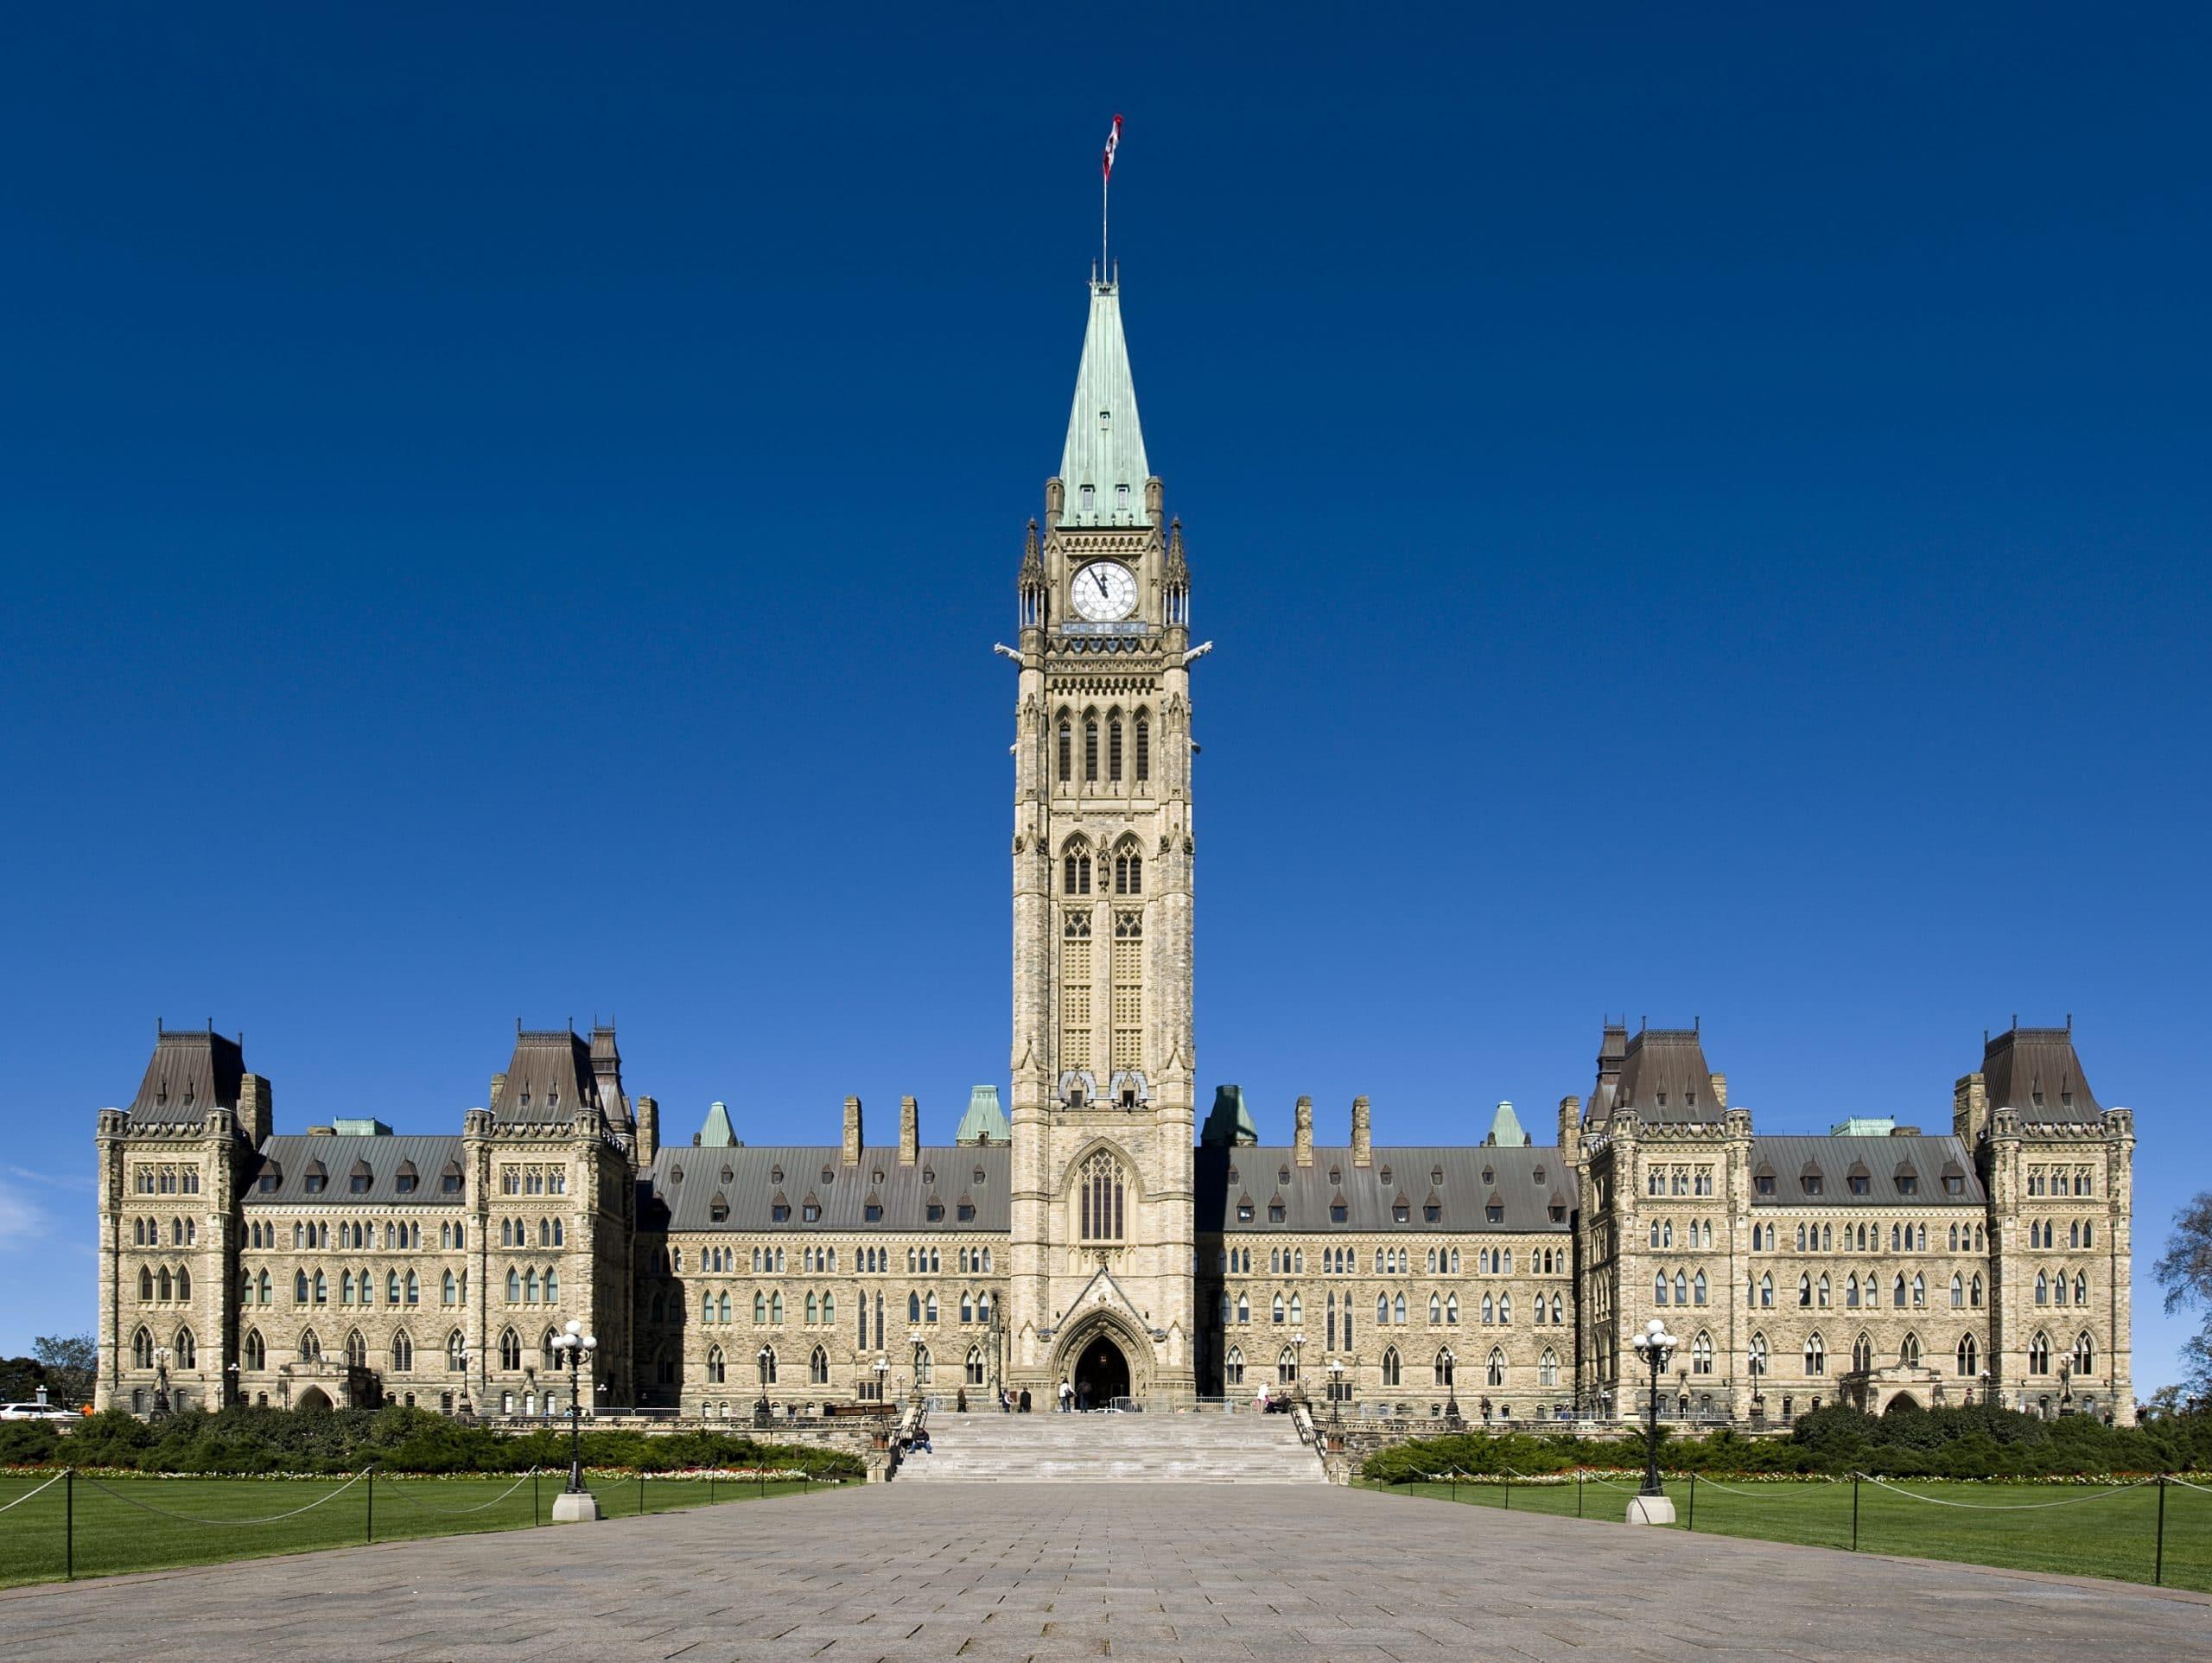 Parliament Hill building in Ottawa